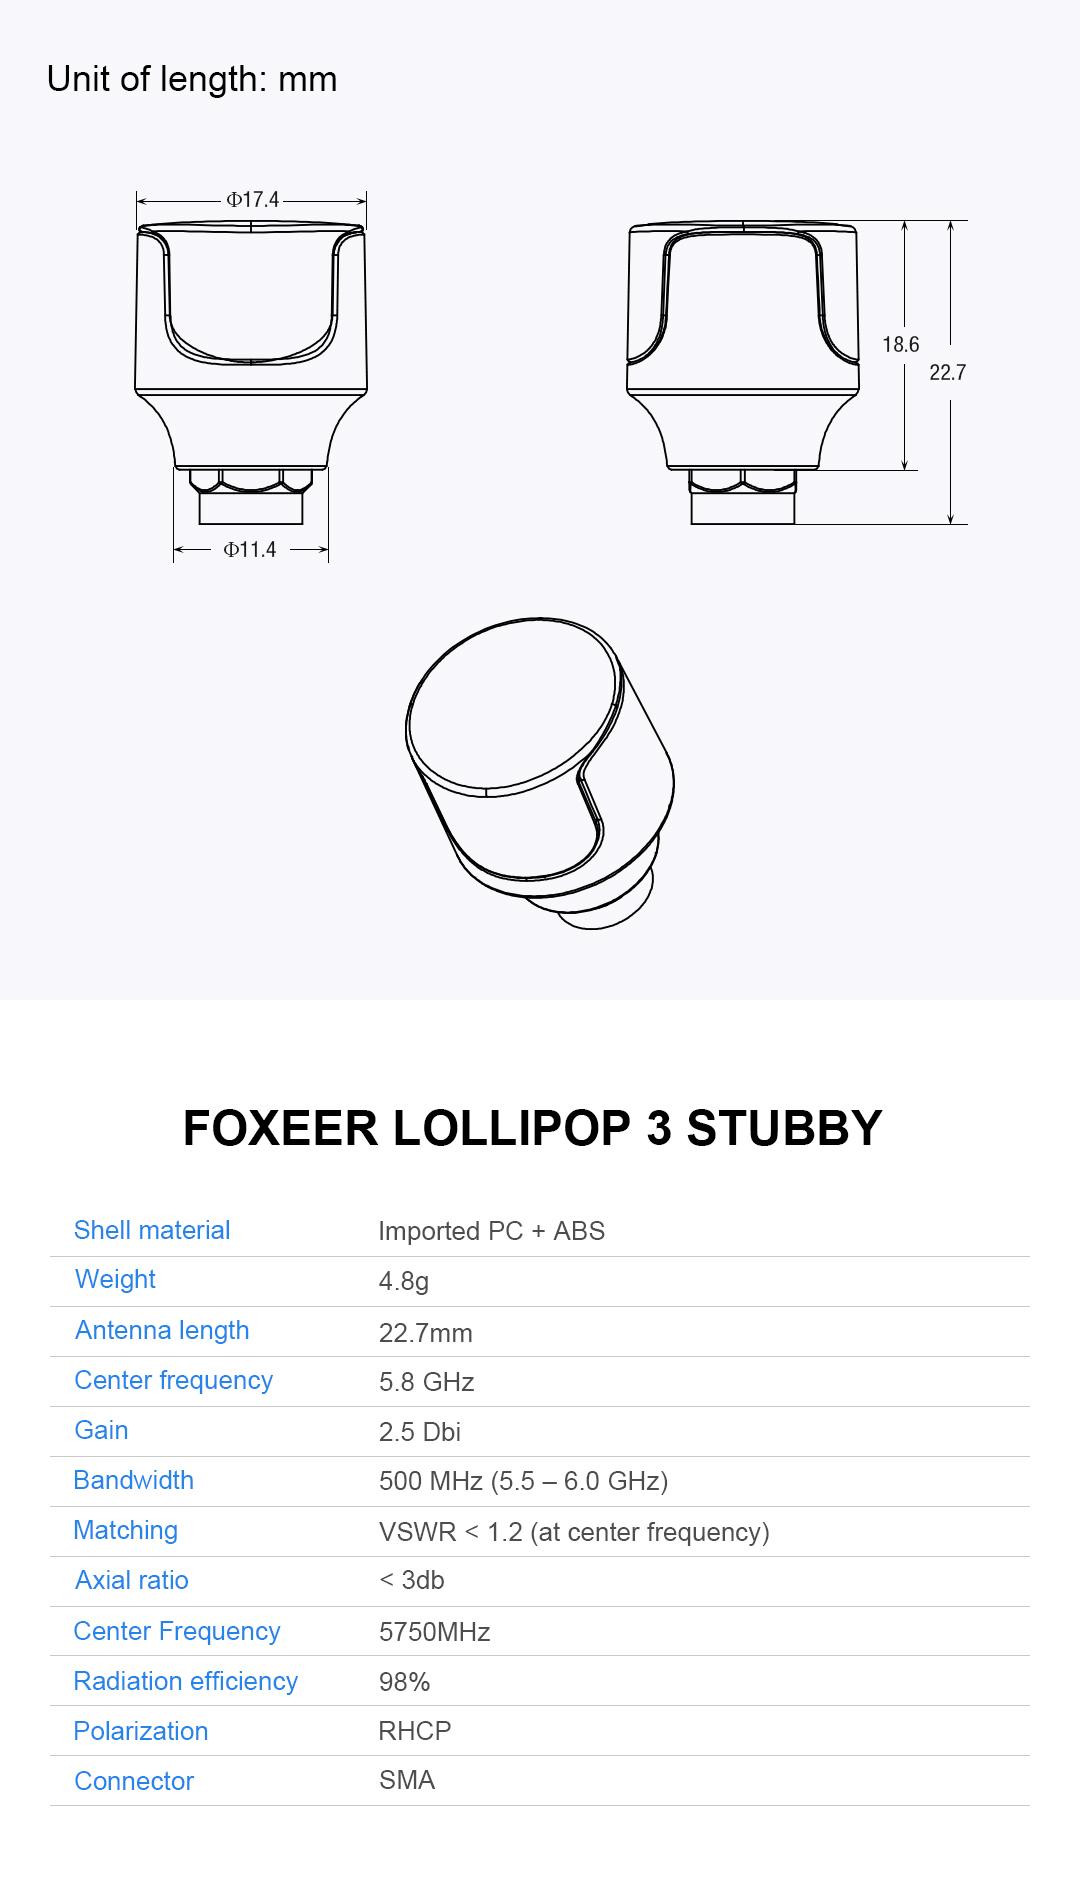 2pcs Foxeer 5.8G Lollipop 3 2.5DBi Stubby Omni FPV Antenna LHCP/RHCP for RC Drone - Photo: 4